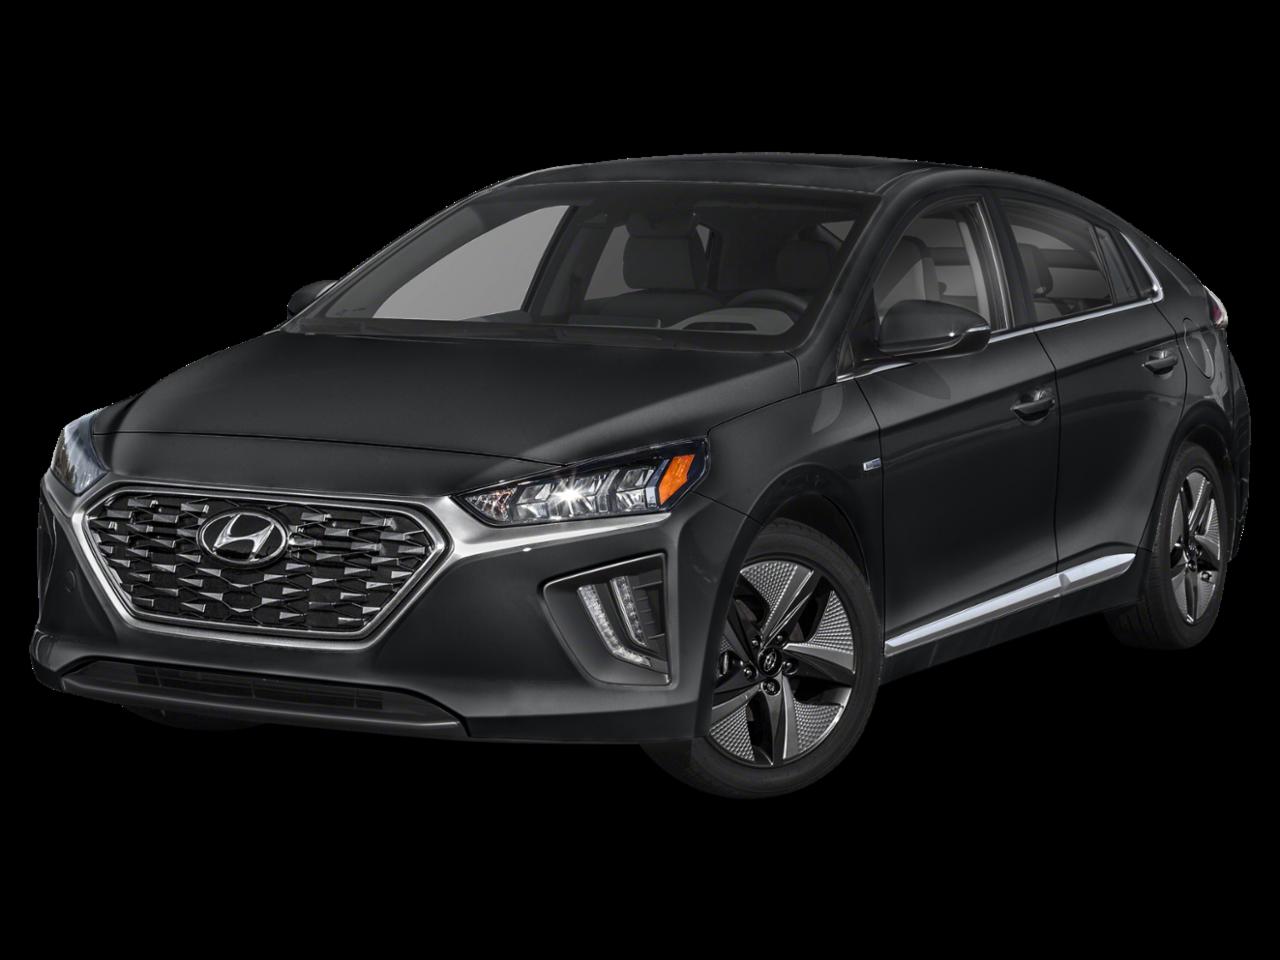 Hyundai 2020 IONIQ Hybrid Limited